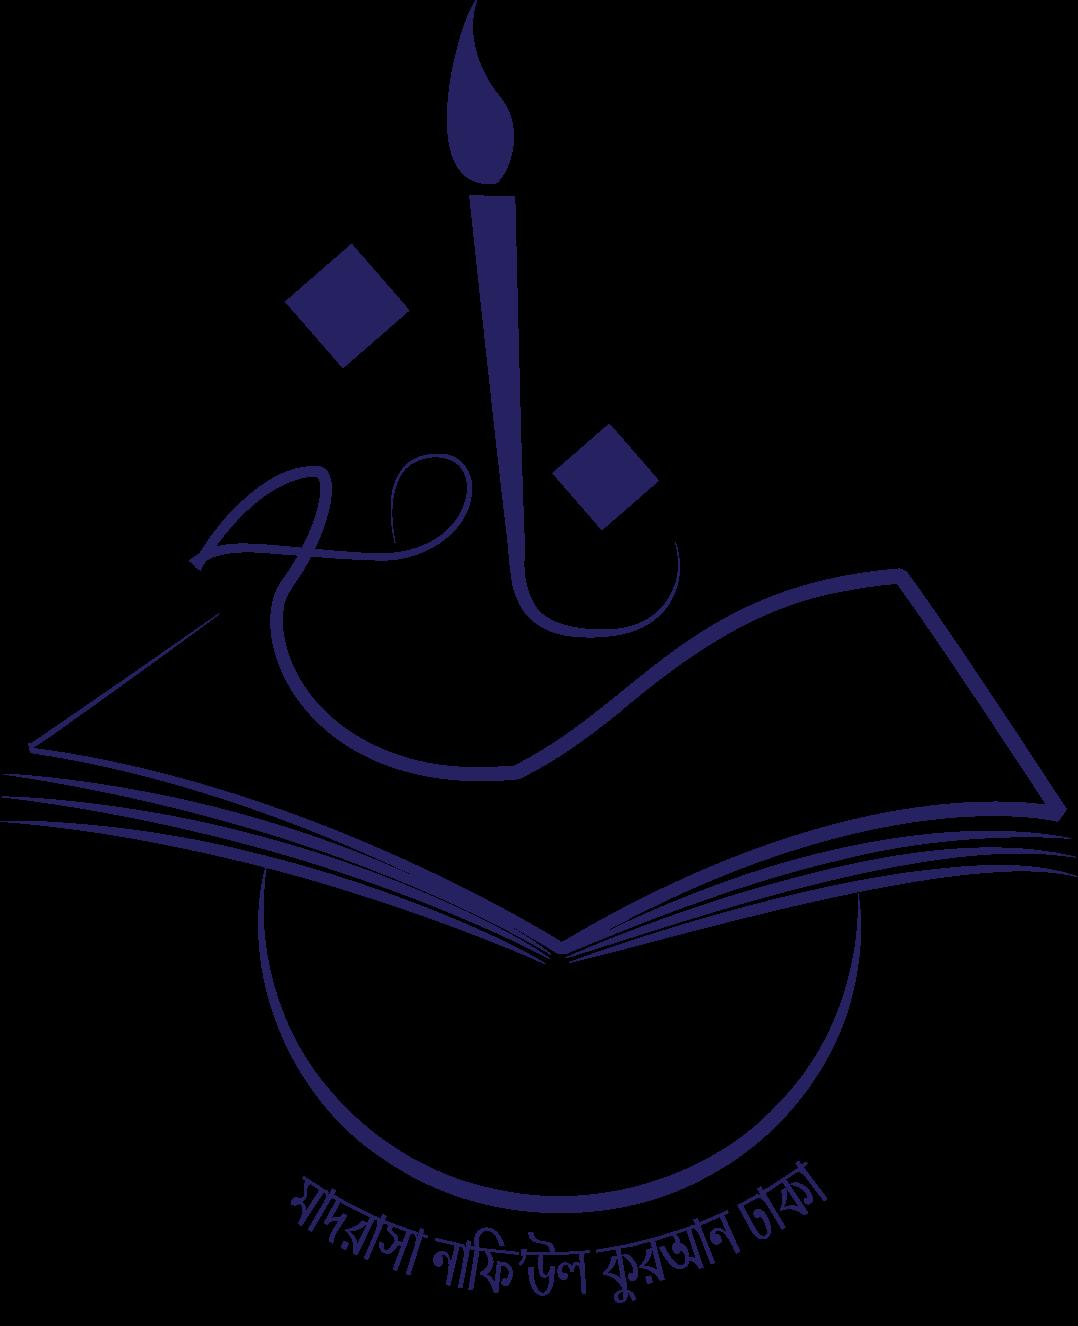 ... logo design school district logo design school logo design samples